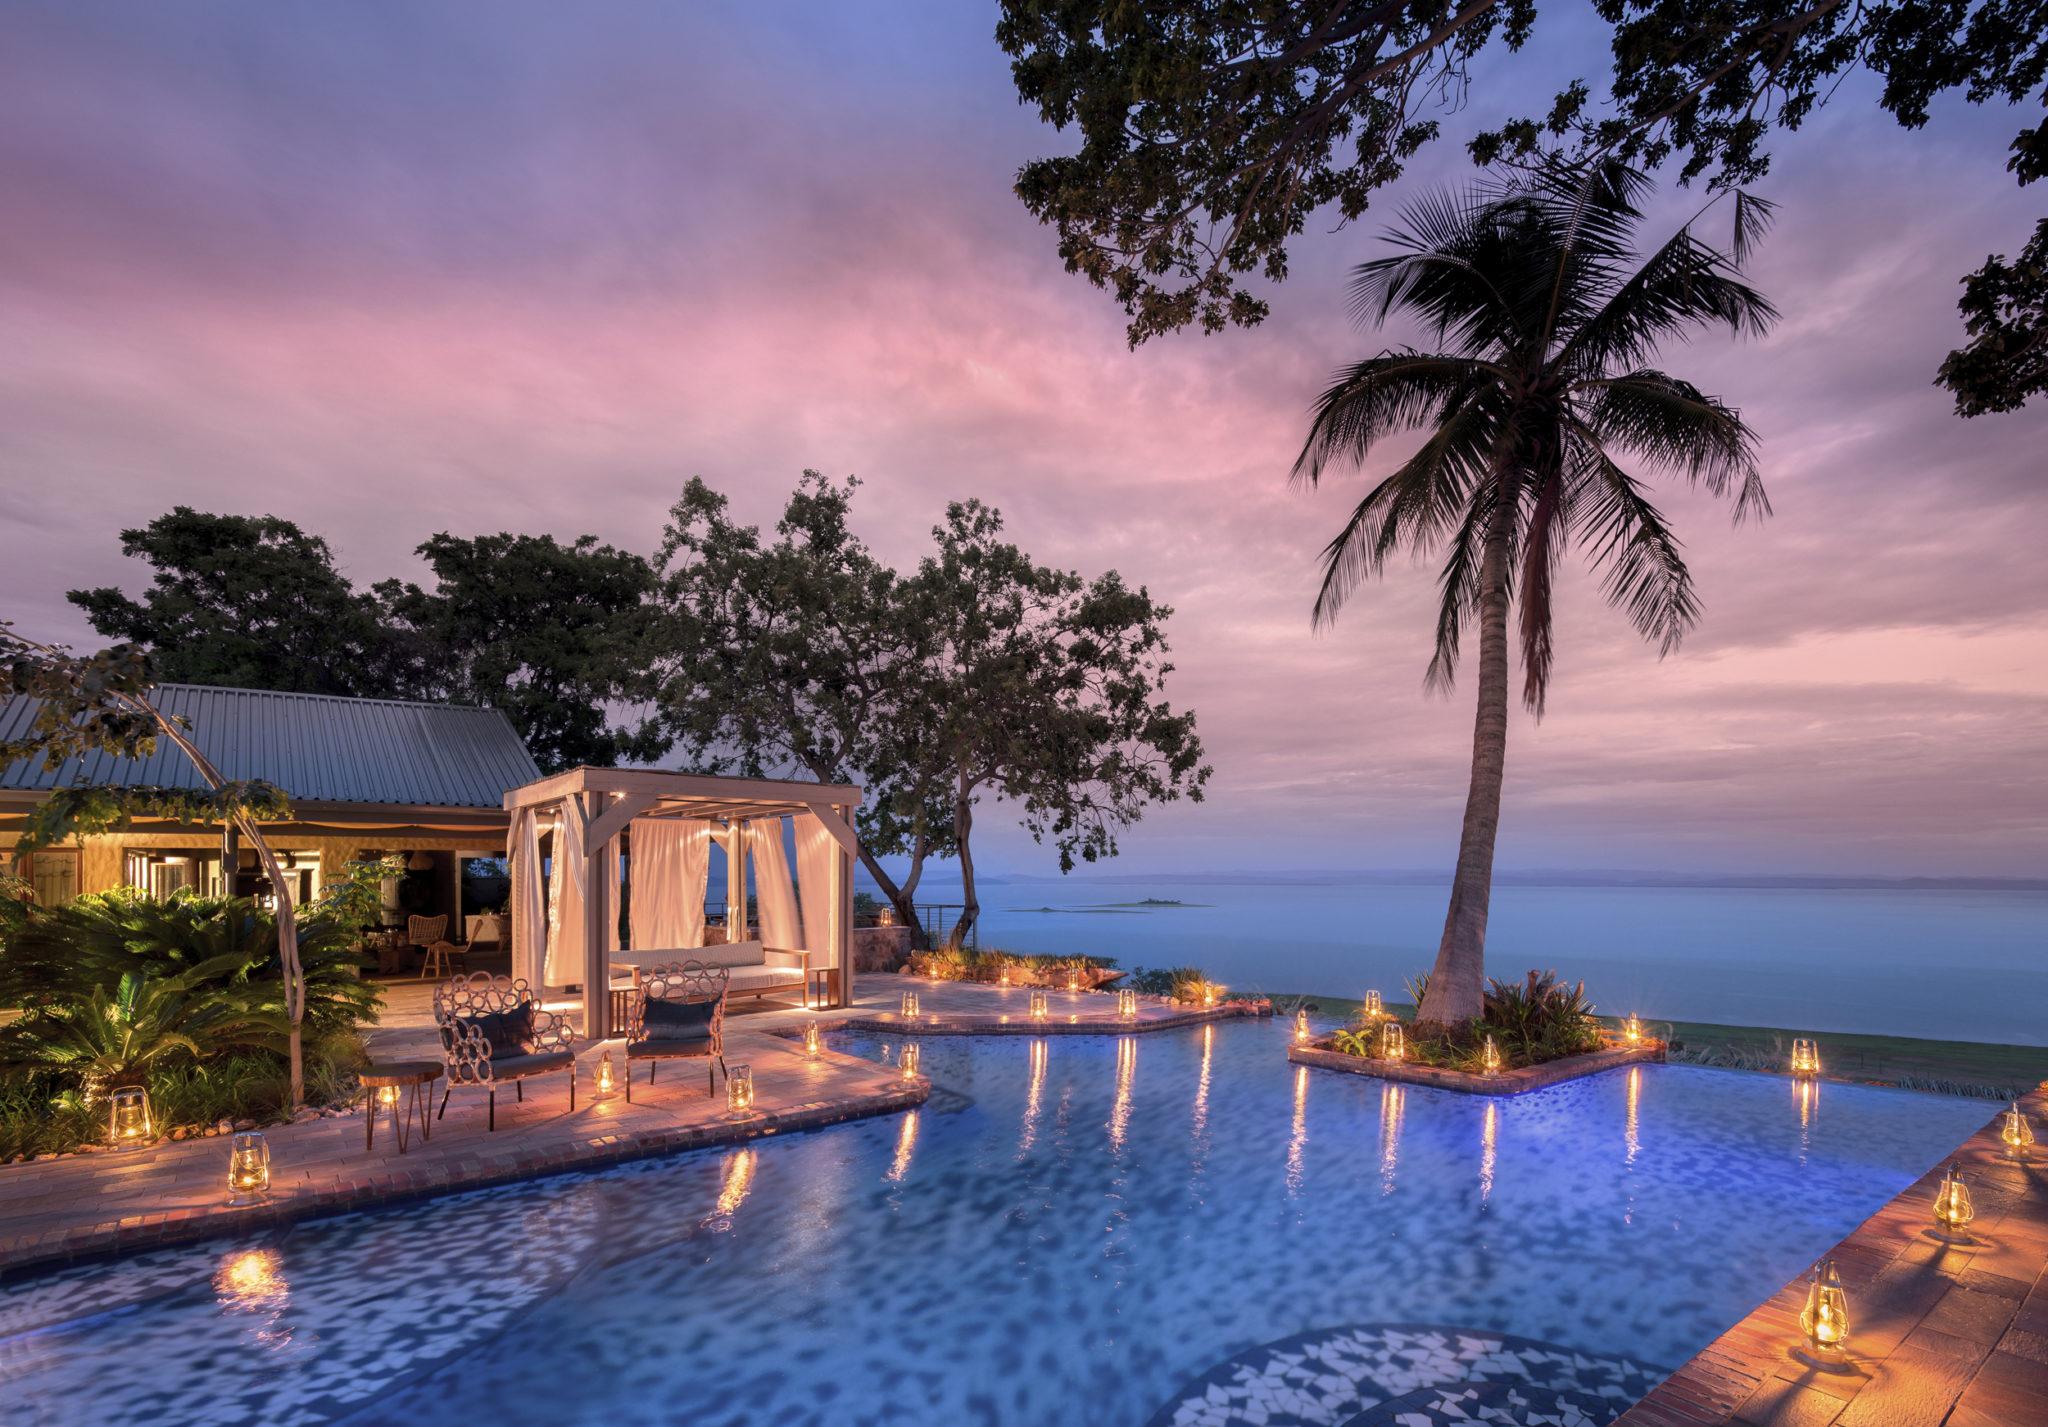 1.-Bumi-Hills-Safari-Lodge_Lake-Kariba_Zimbabwe_A-Luxury-Safari-Lodge_-Inifinty-Pool-African-Bush-Camps-4.jpg